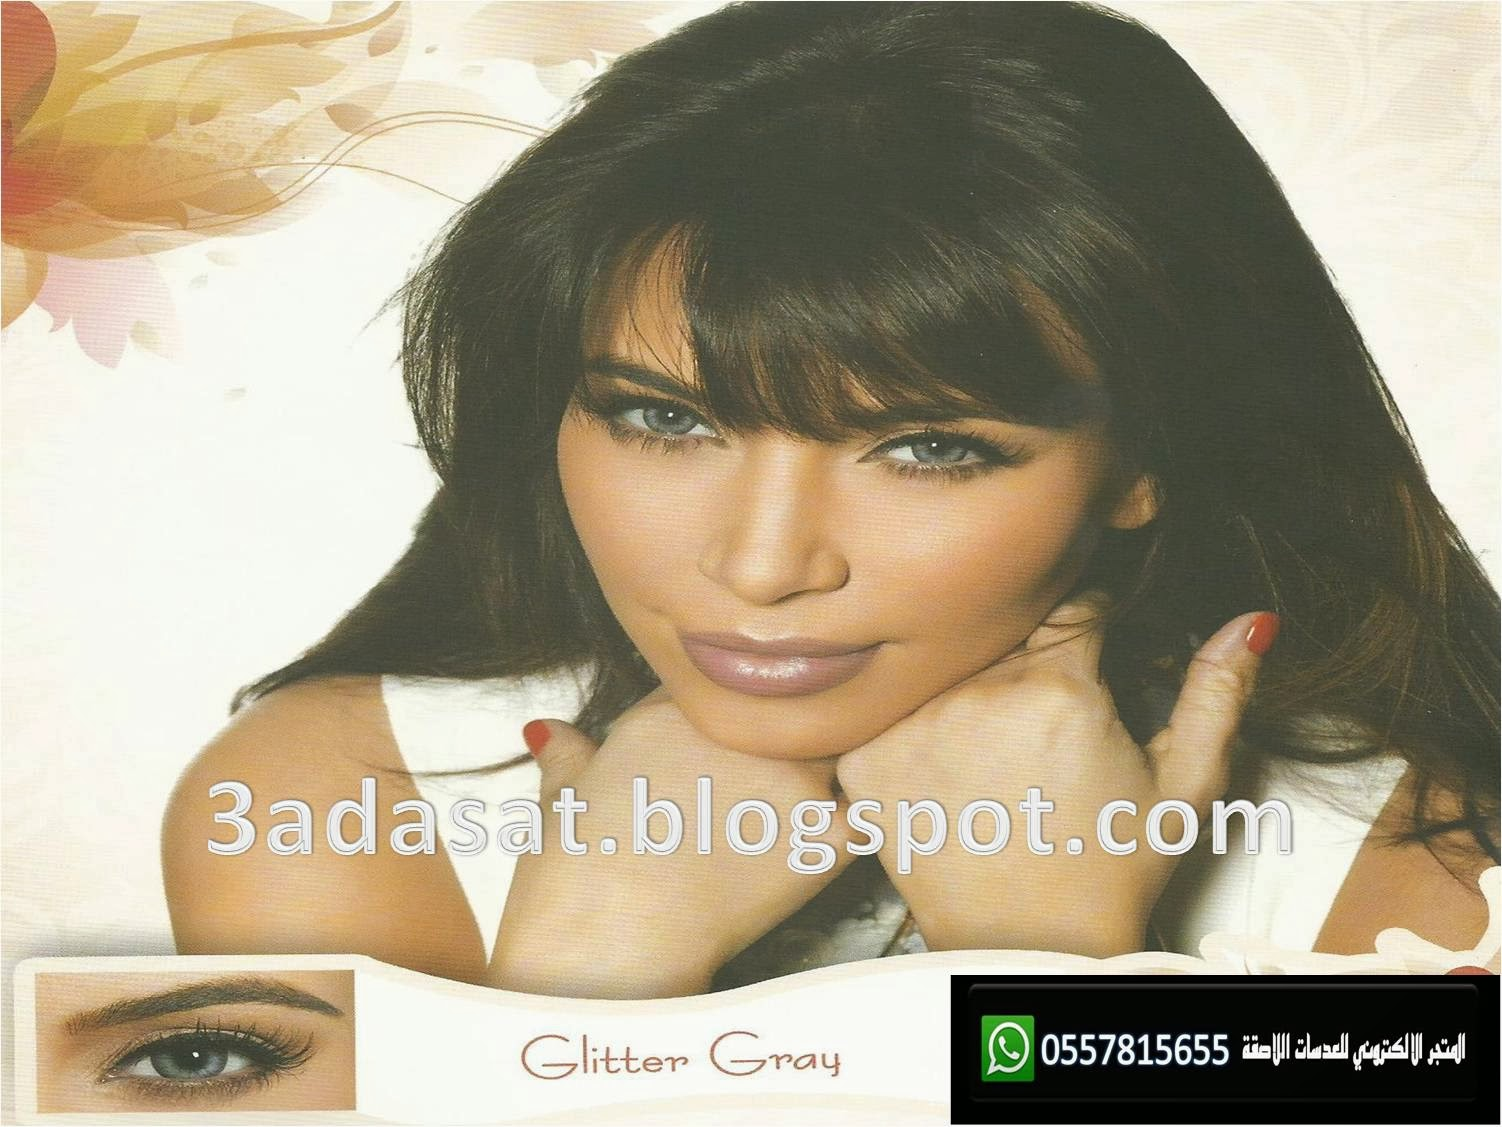 عدسات كيم كارداشيان bella diamonds contact lenses